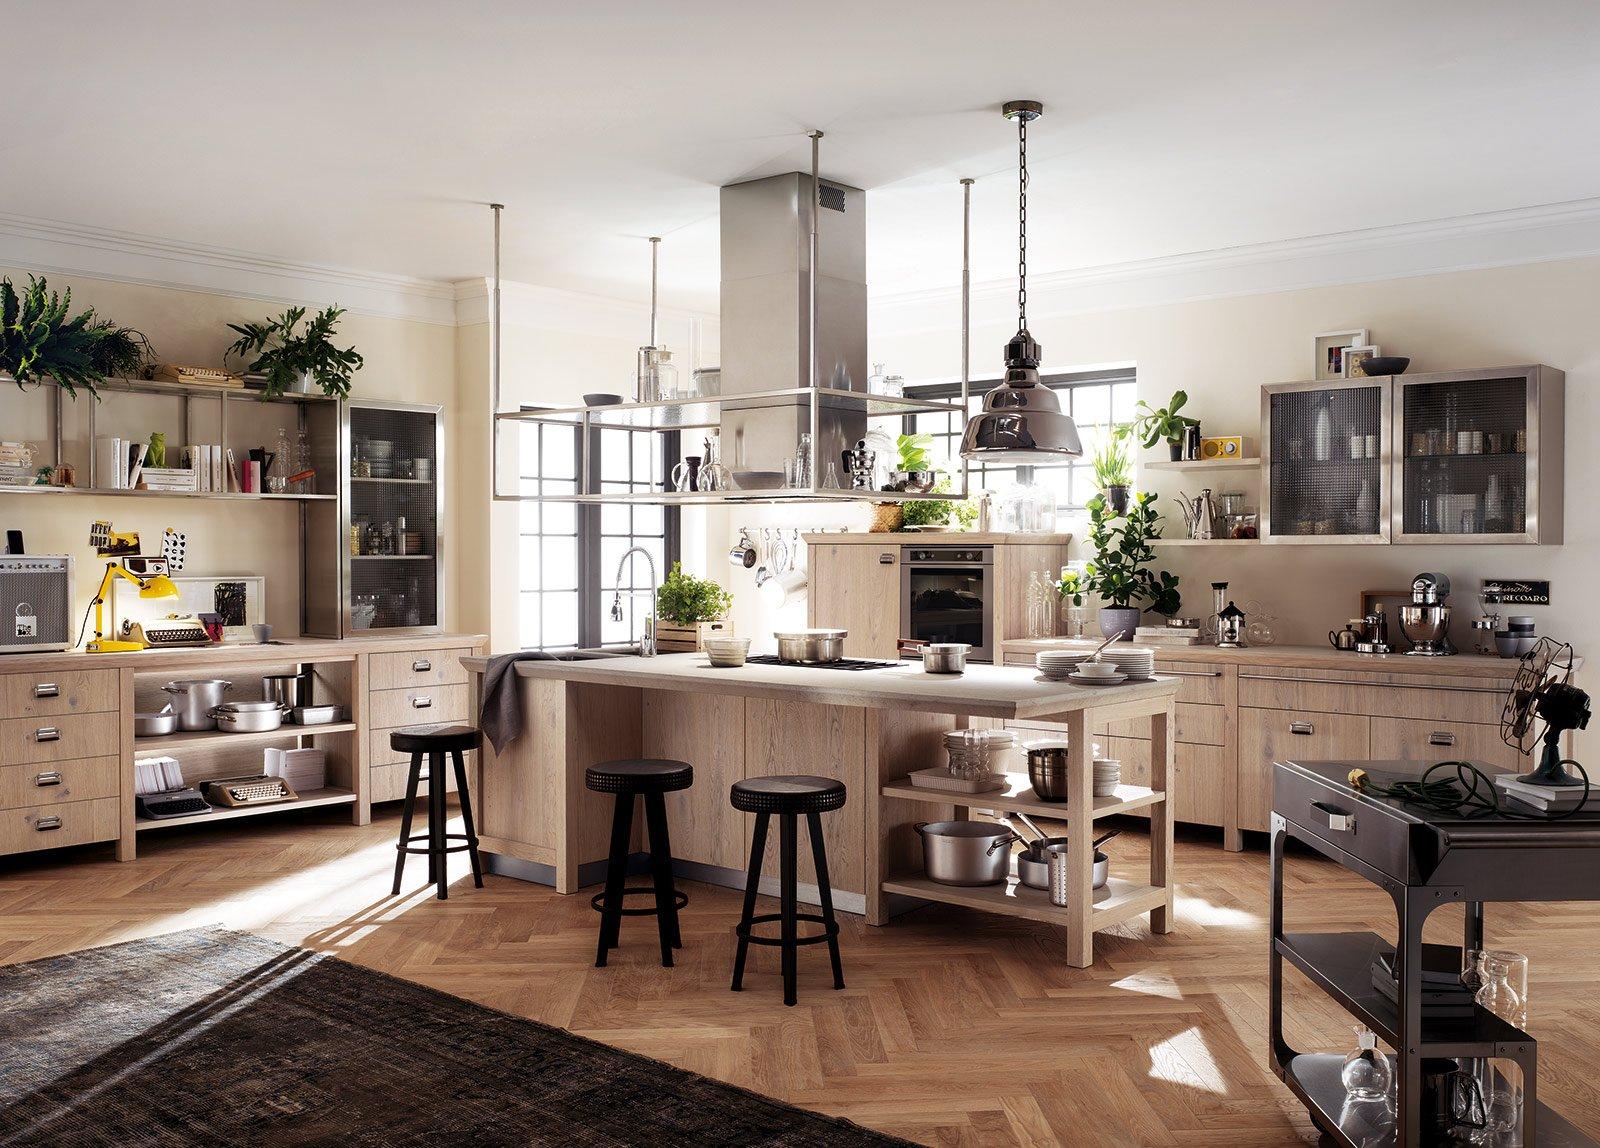 Stile vintage per Diesel Social Kitchen di Scavolini, la grande cucina ...